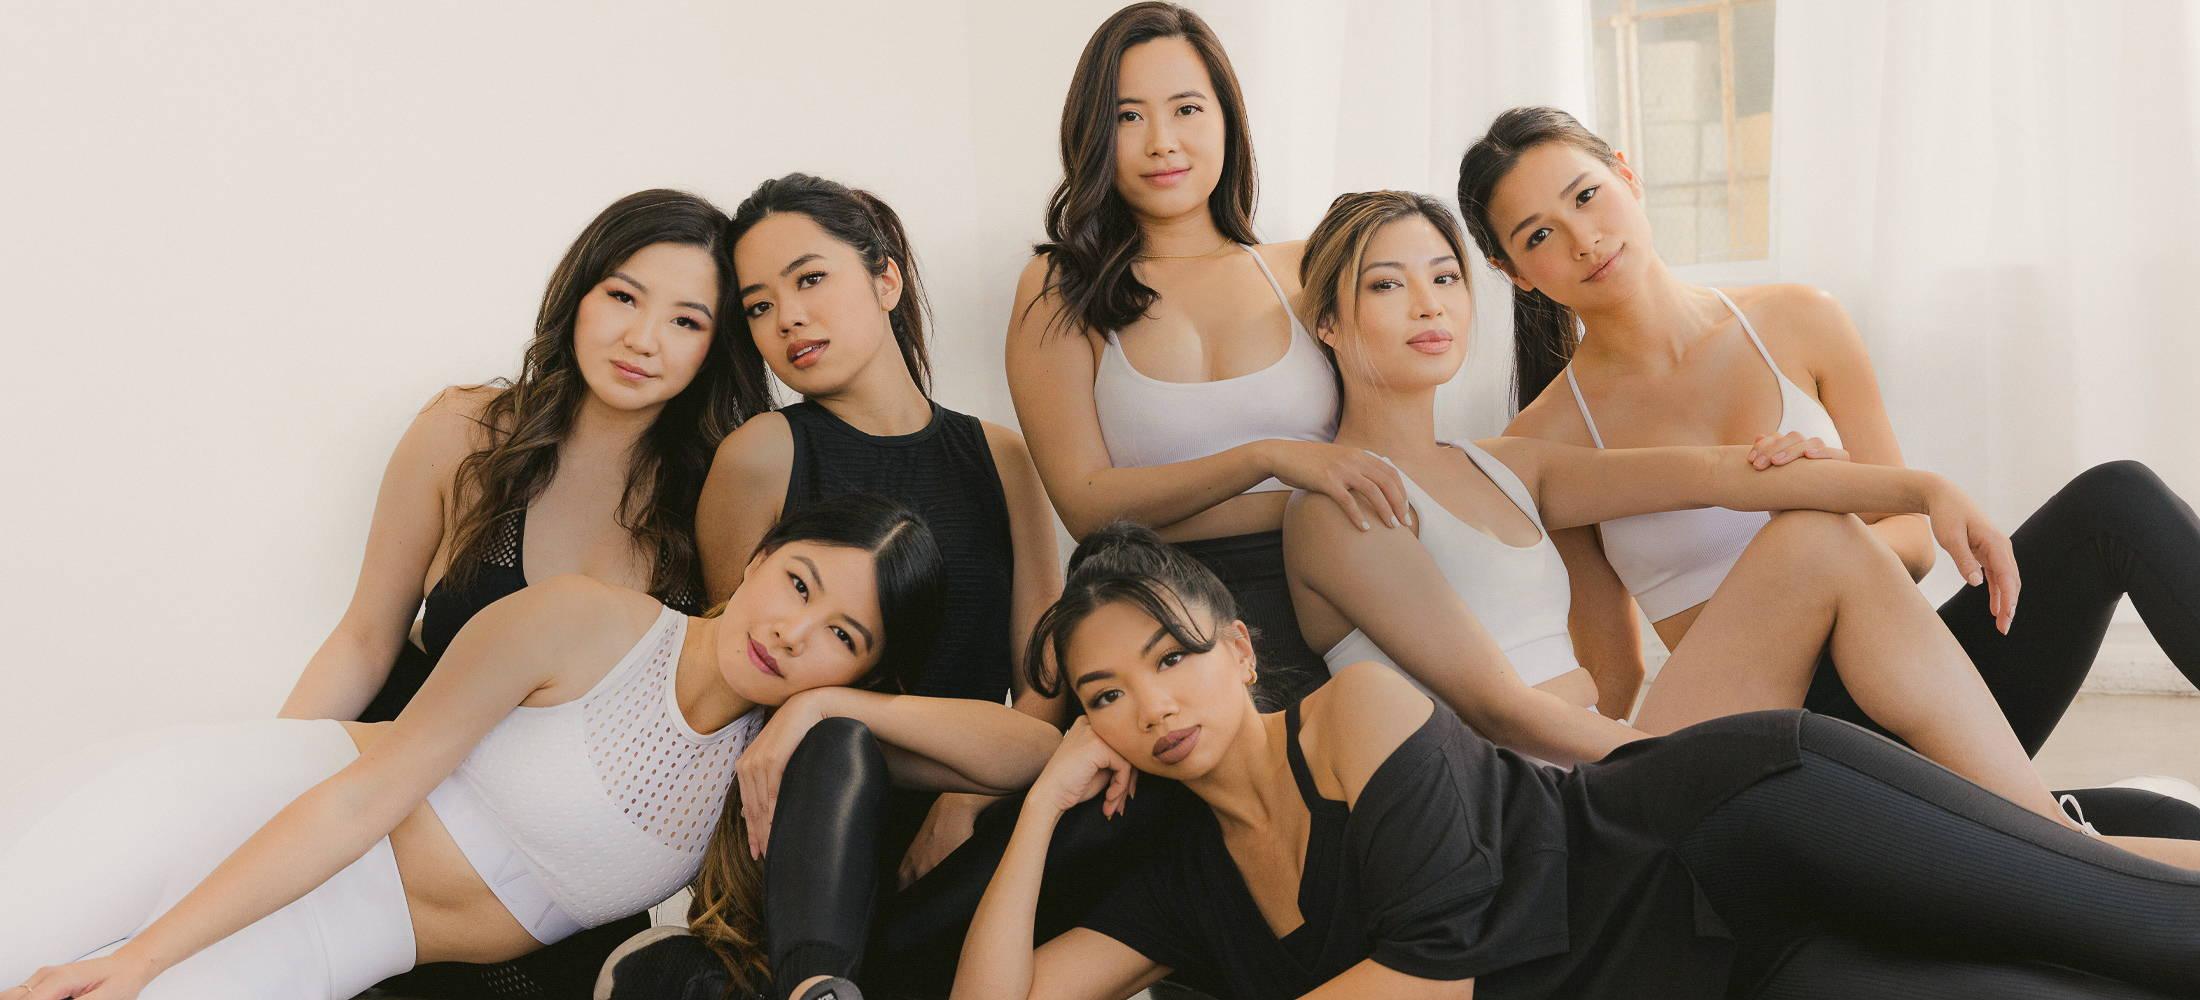 A group of six women.